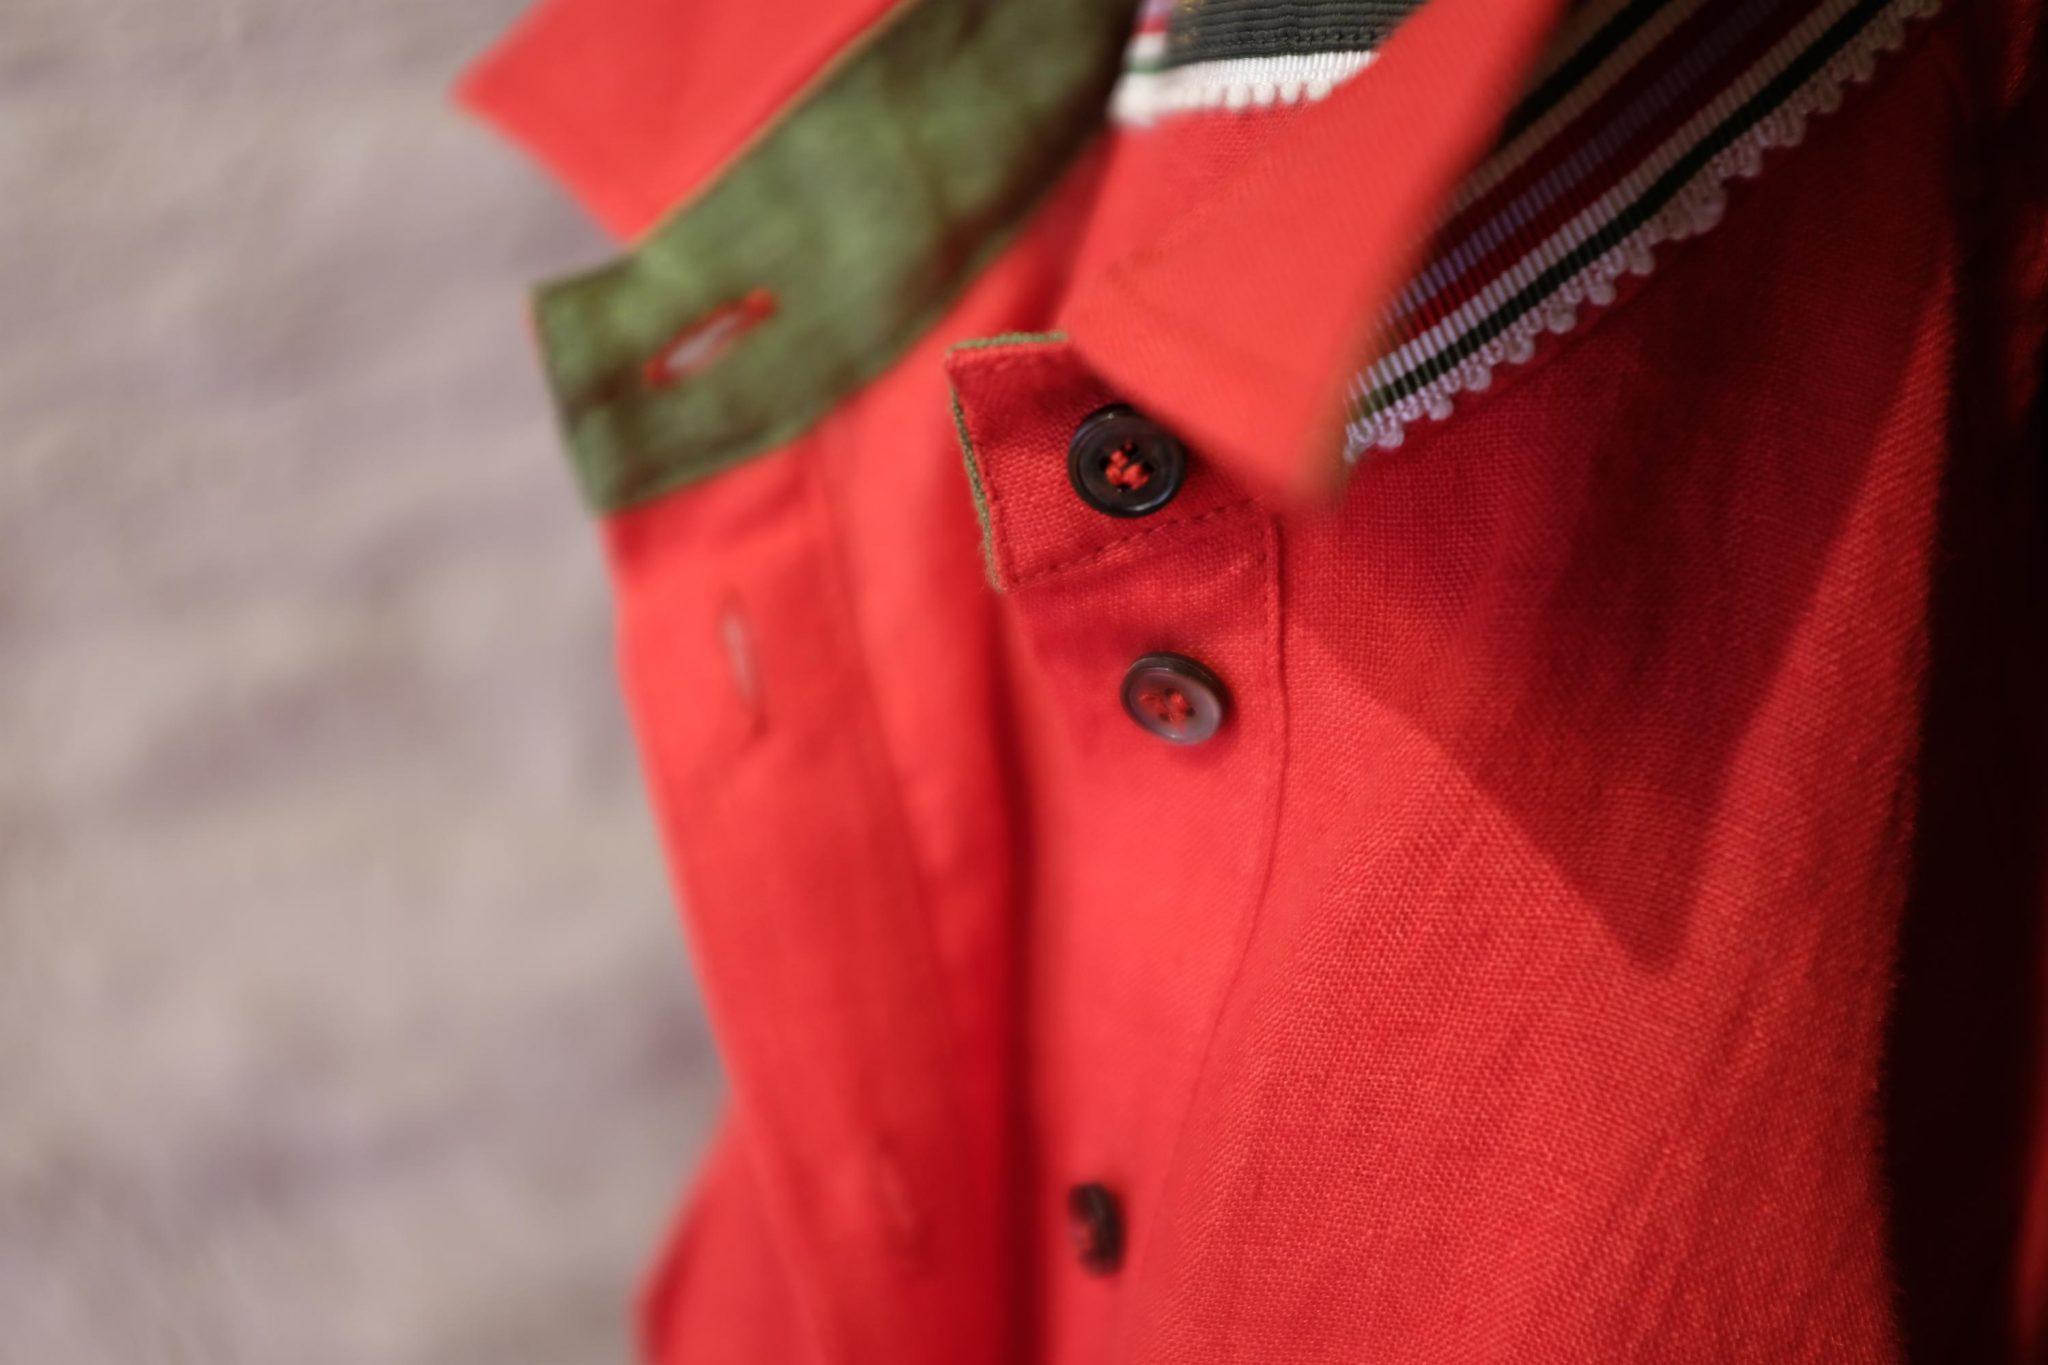 Rode jurk detail kraag